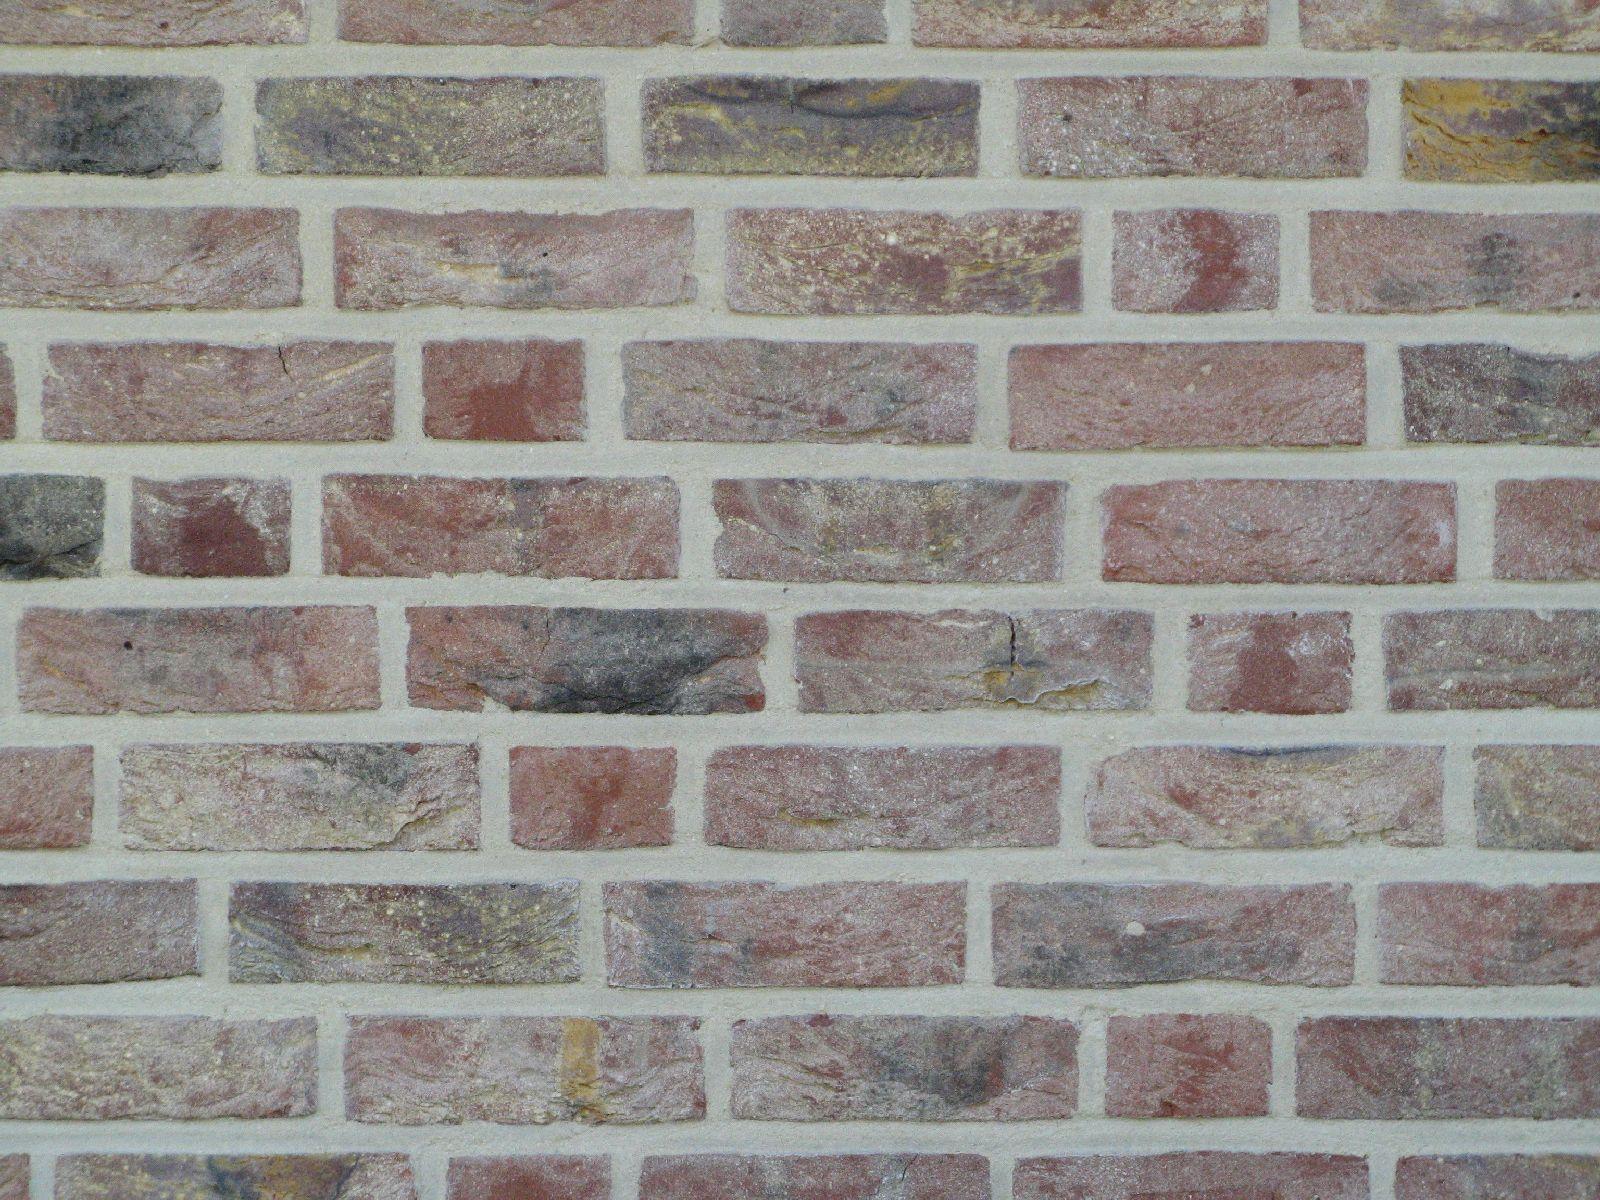 Brick_Texture_B_00863